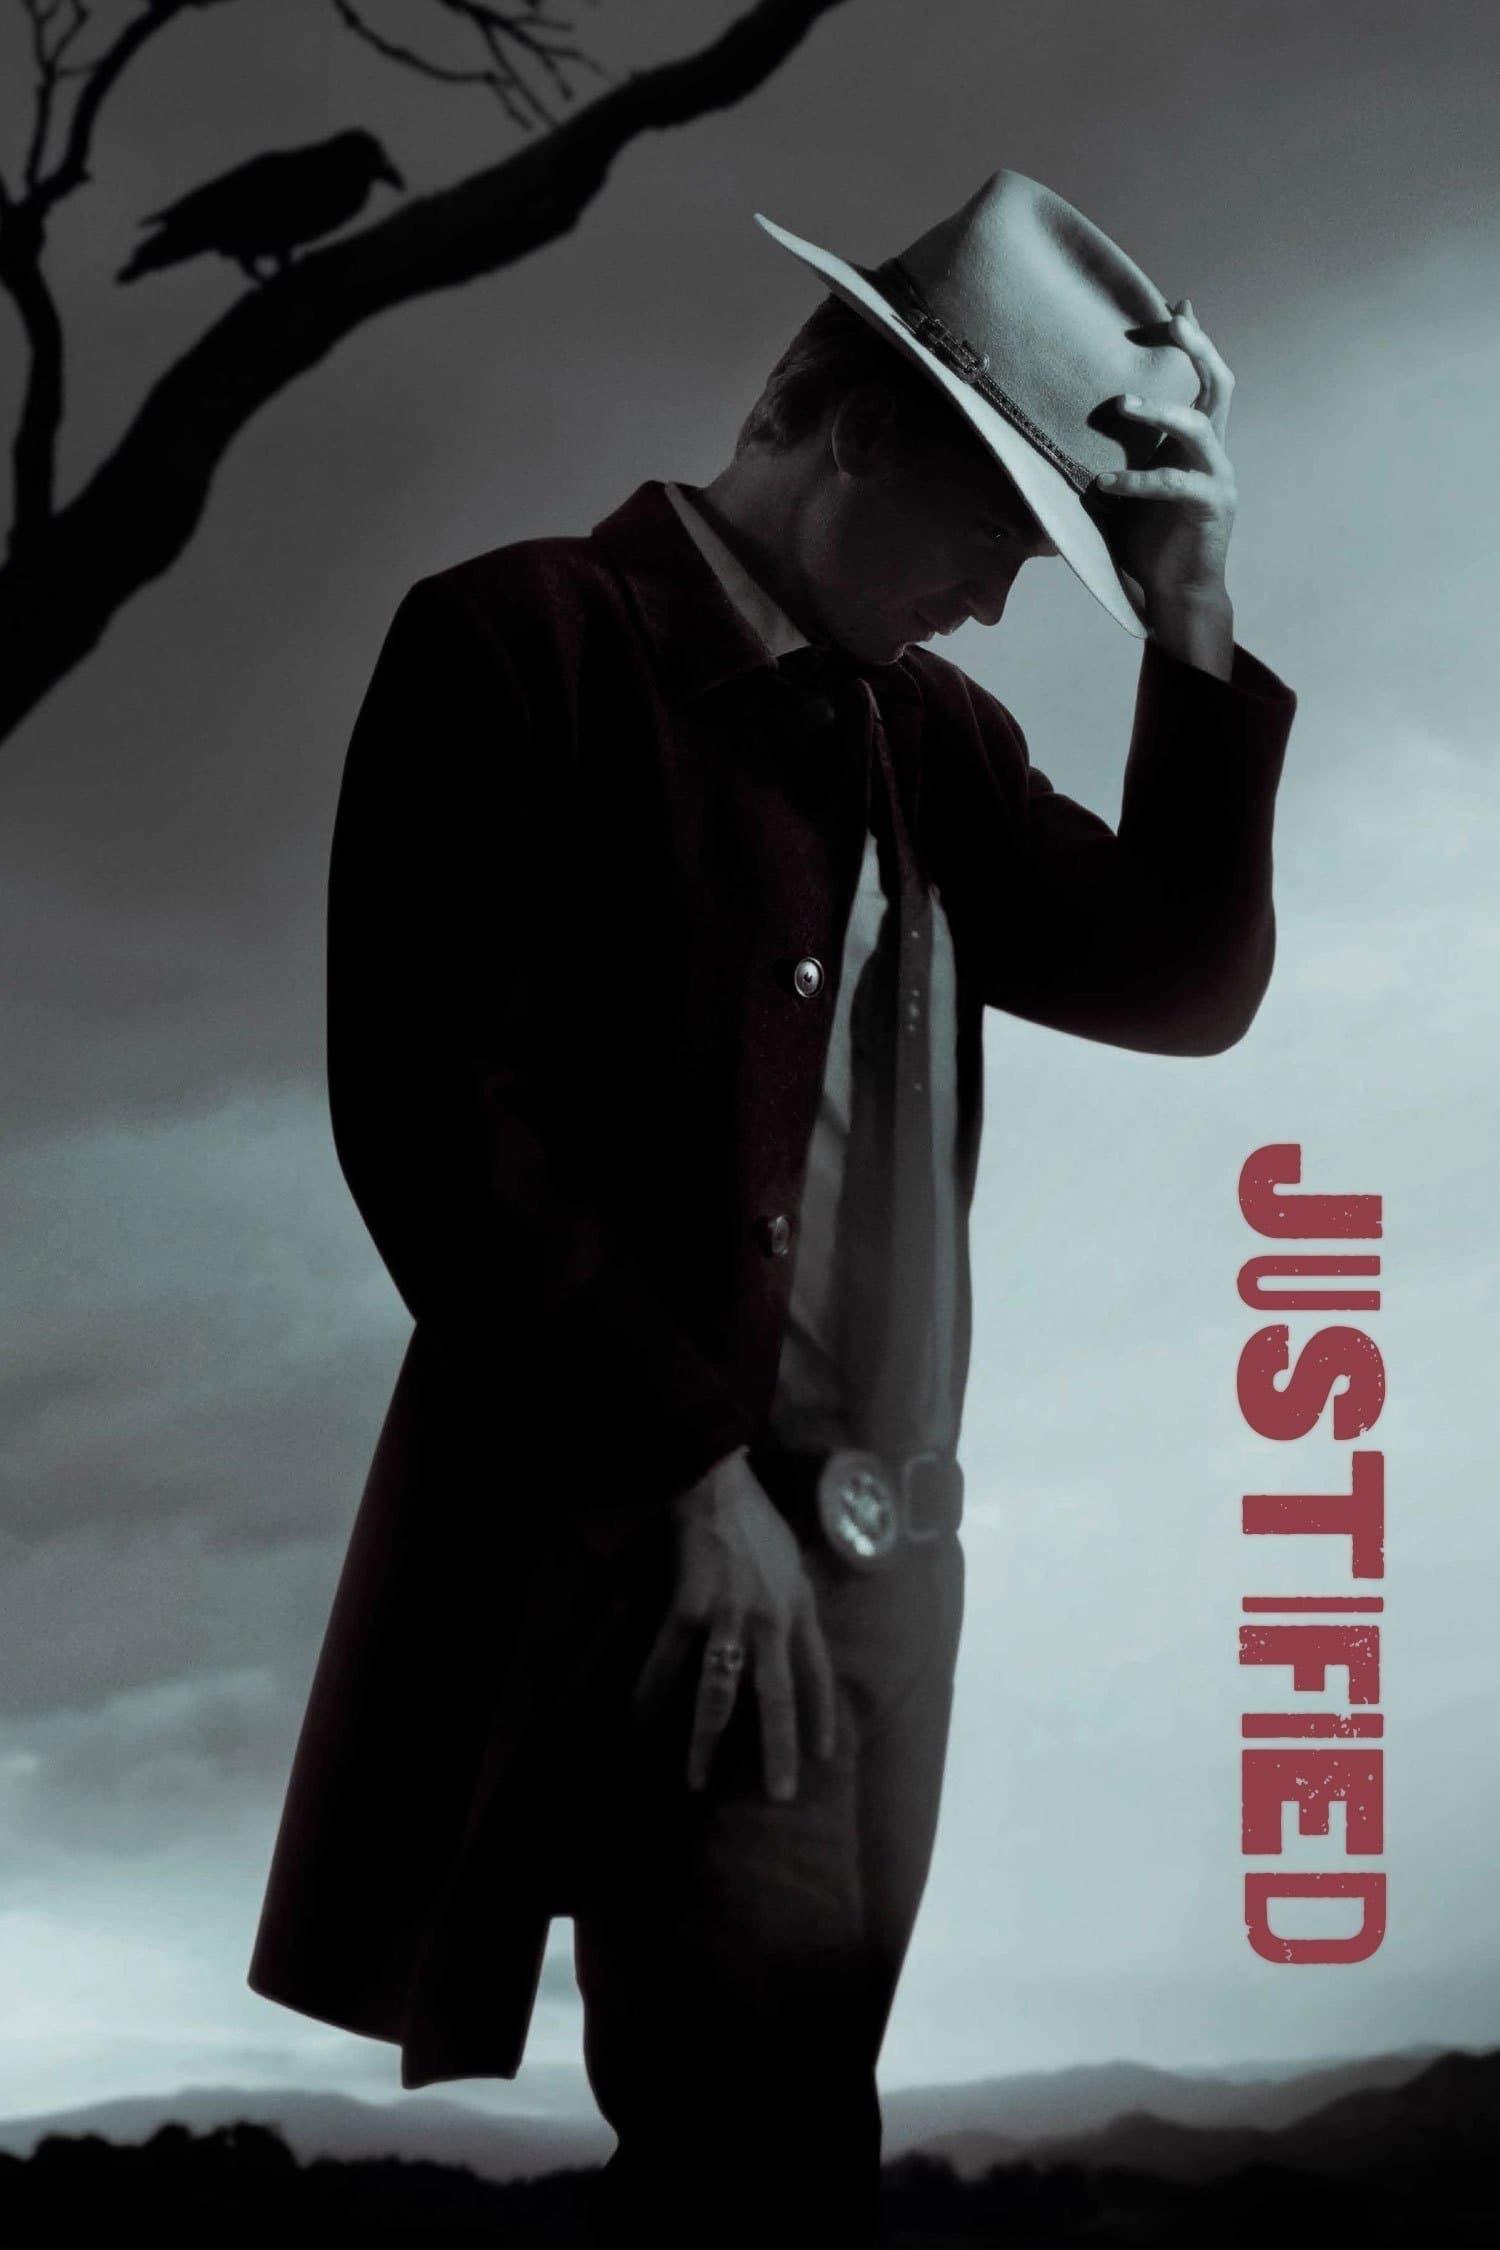 Póster Justified: la ley de Raylan